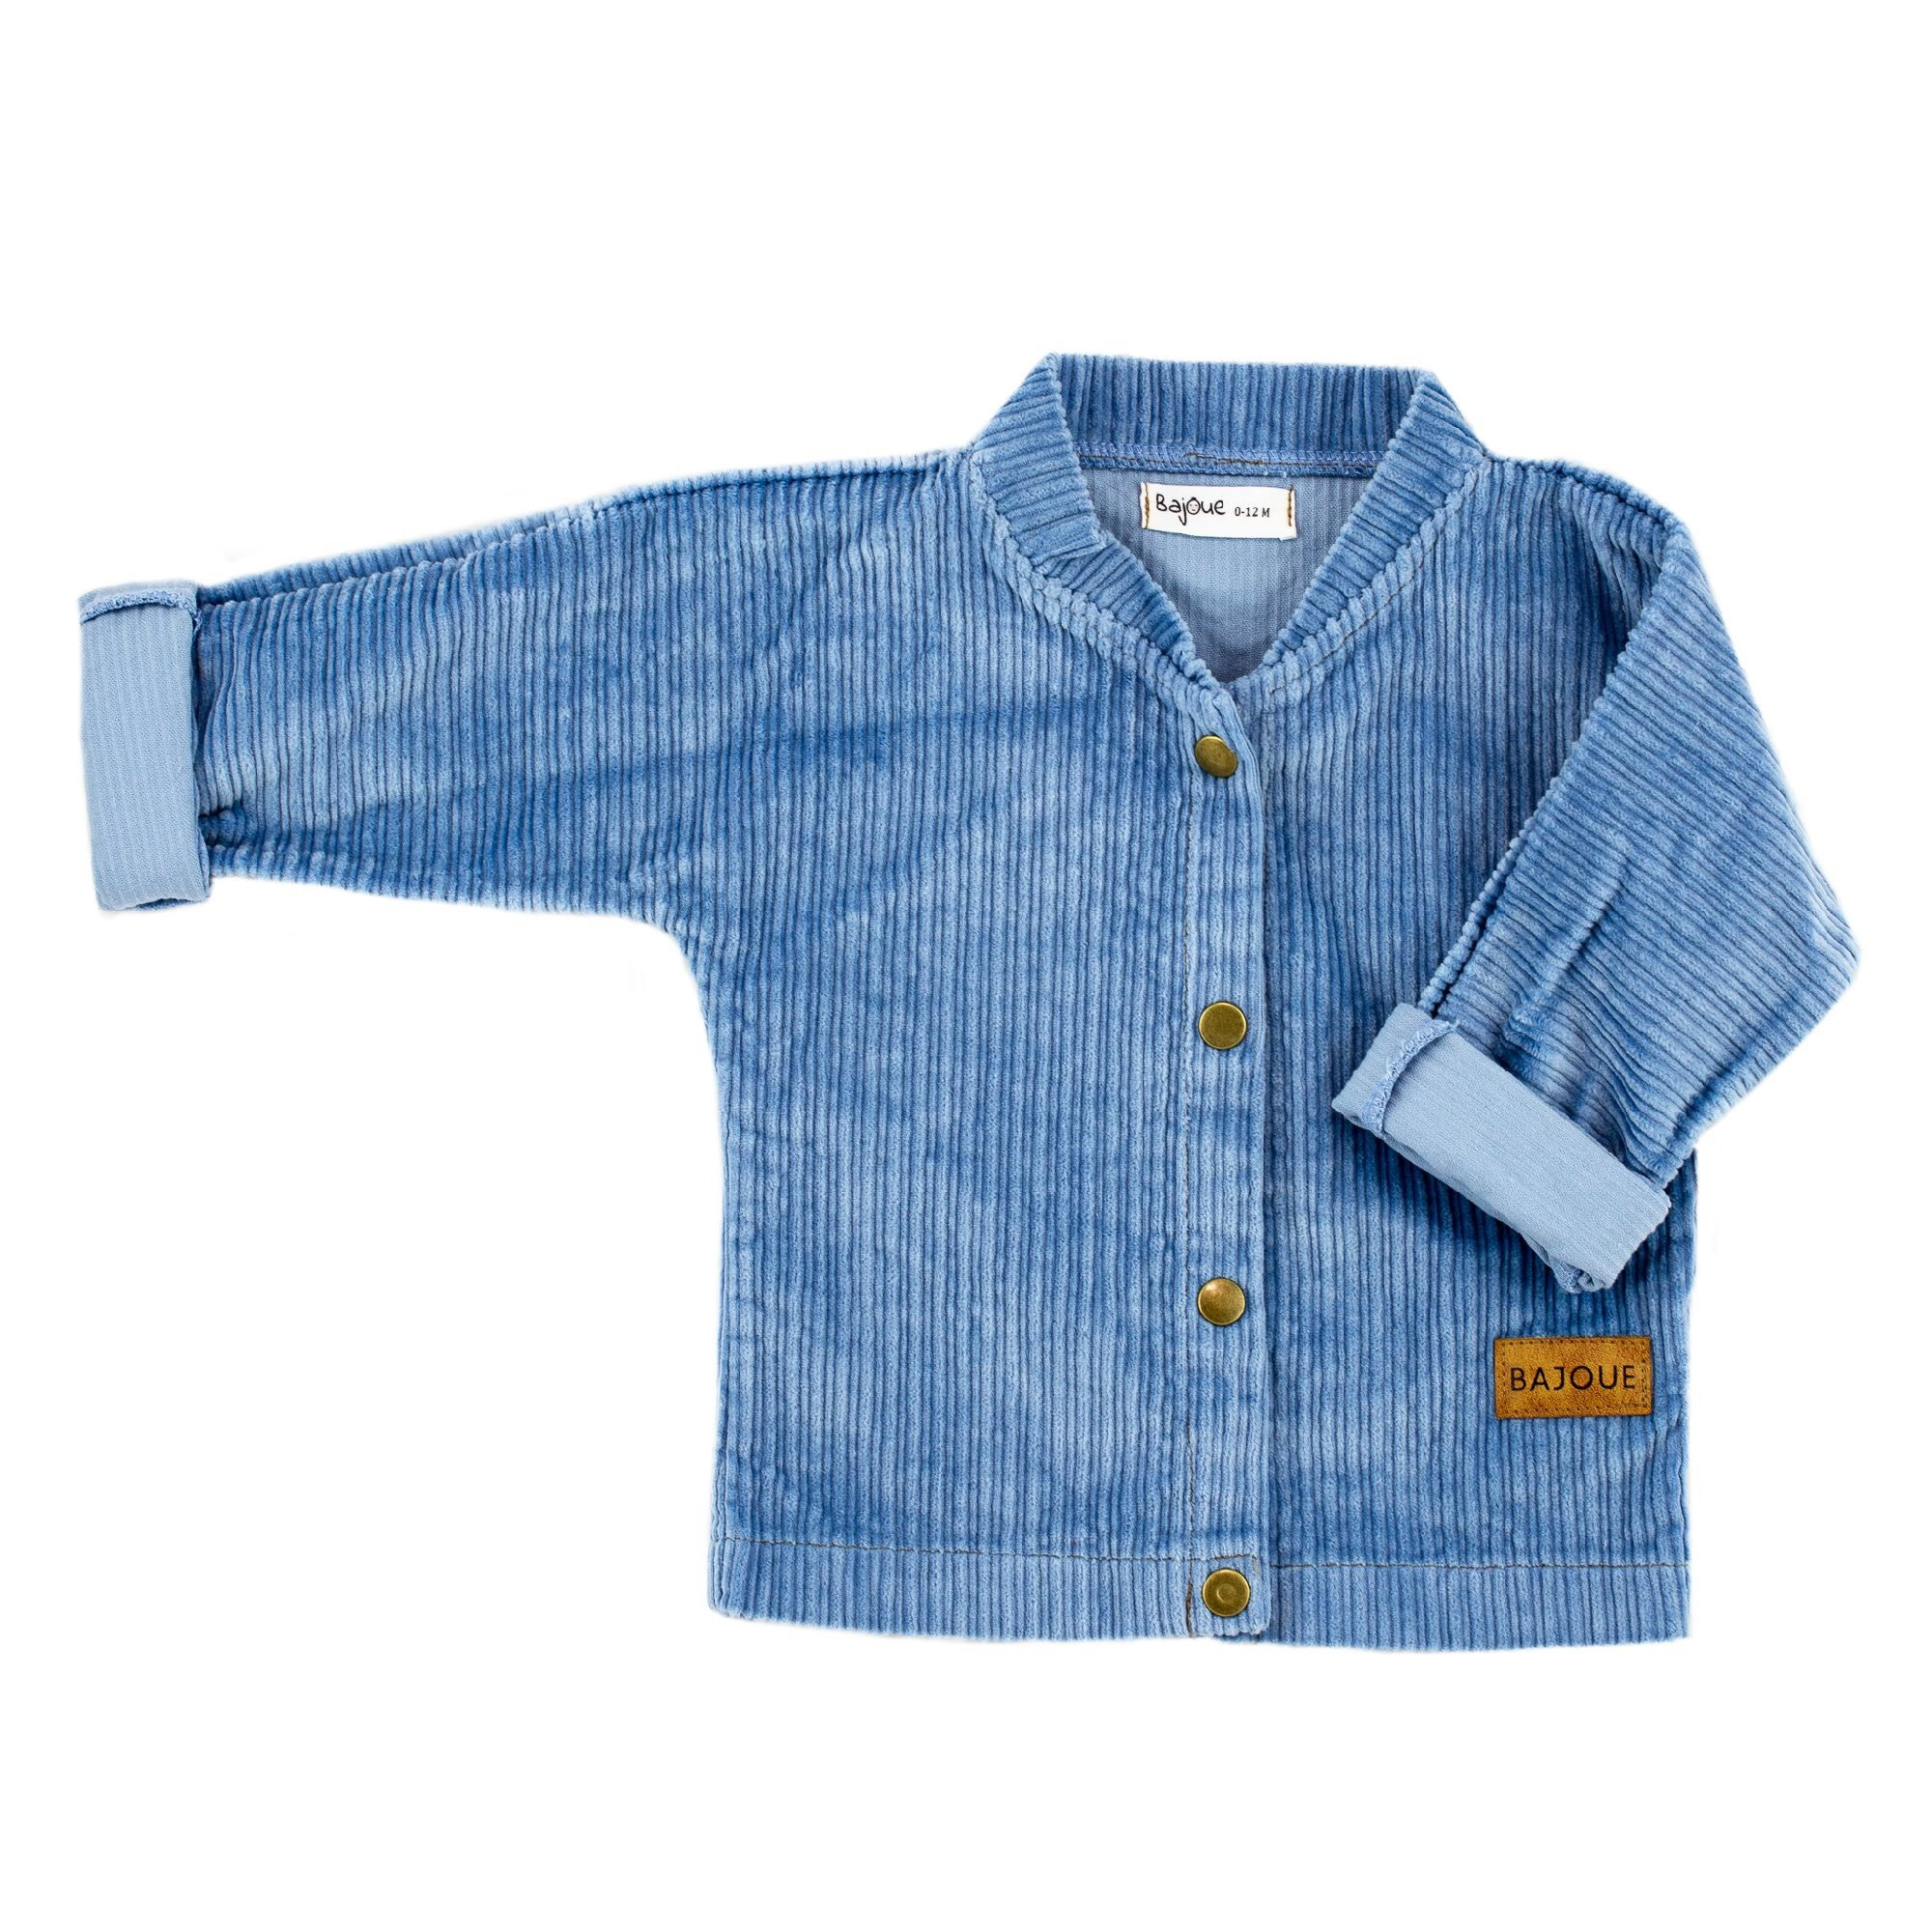 Bajoue Baby Blue Mini Jacket